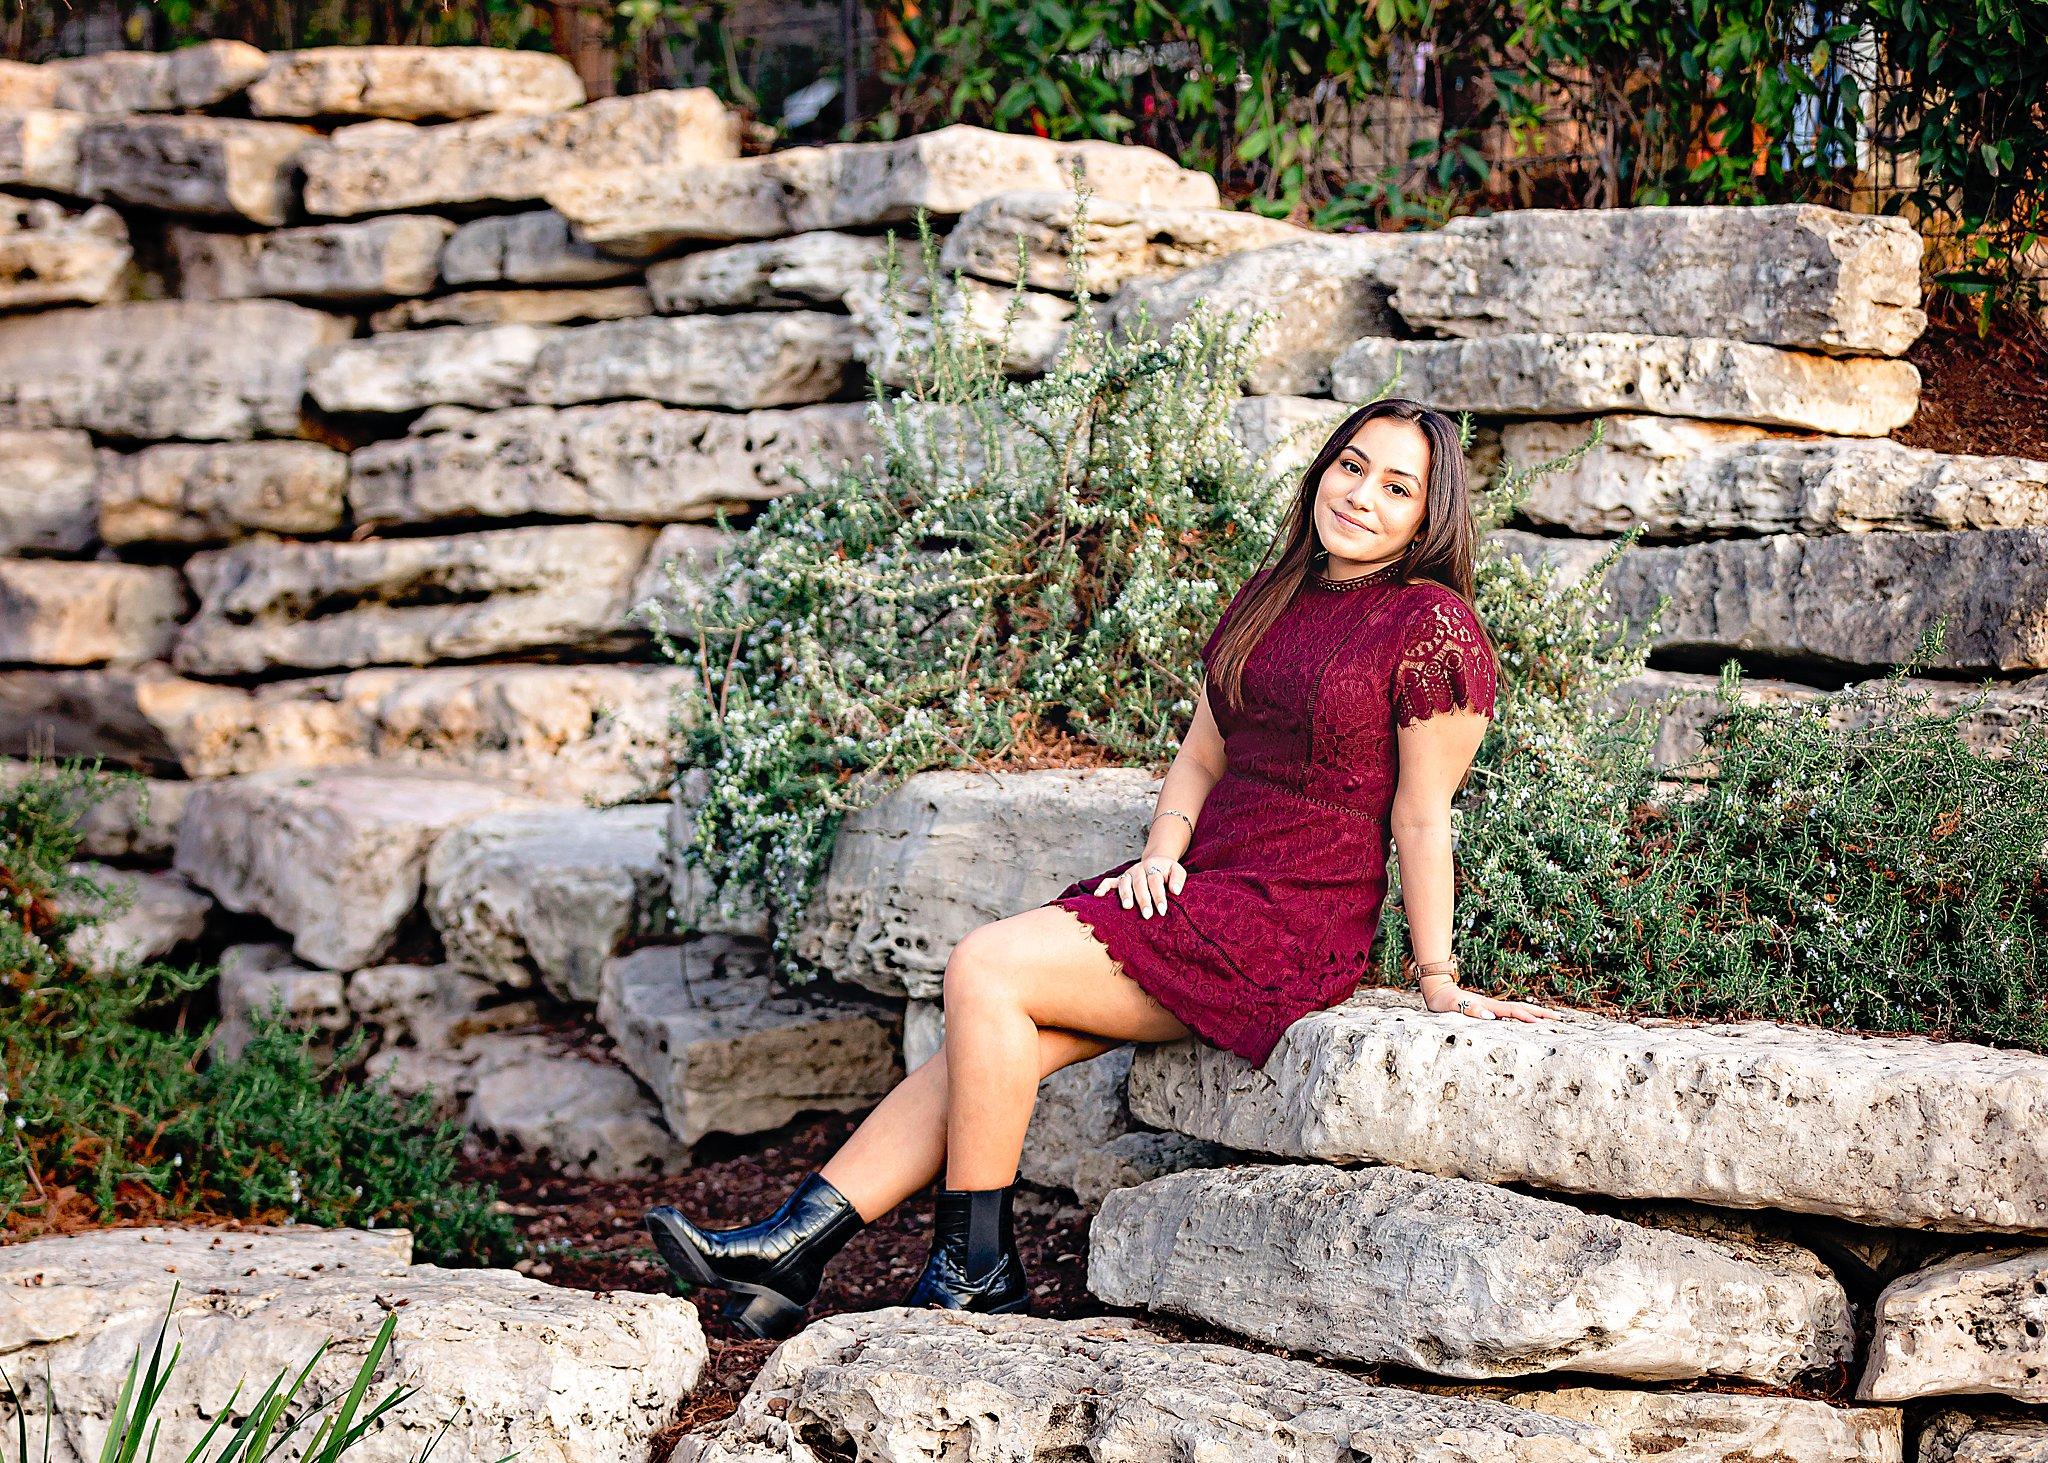 Carly-Barton-Photography-Texas-Photographer-High-School-Senior-Photos-The-Historic-Pearl-San-Antonio_0025.jpg